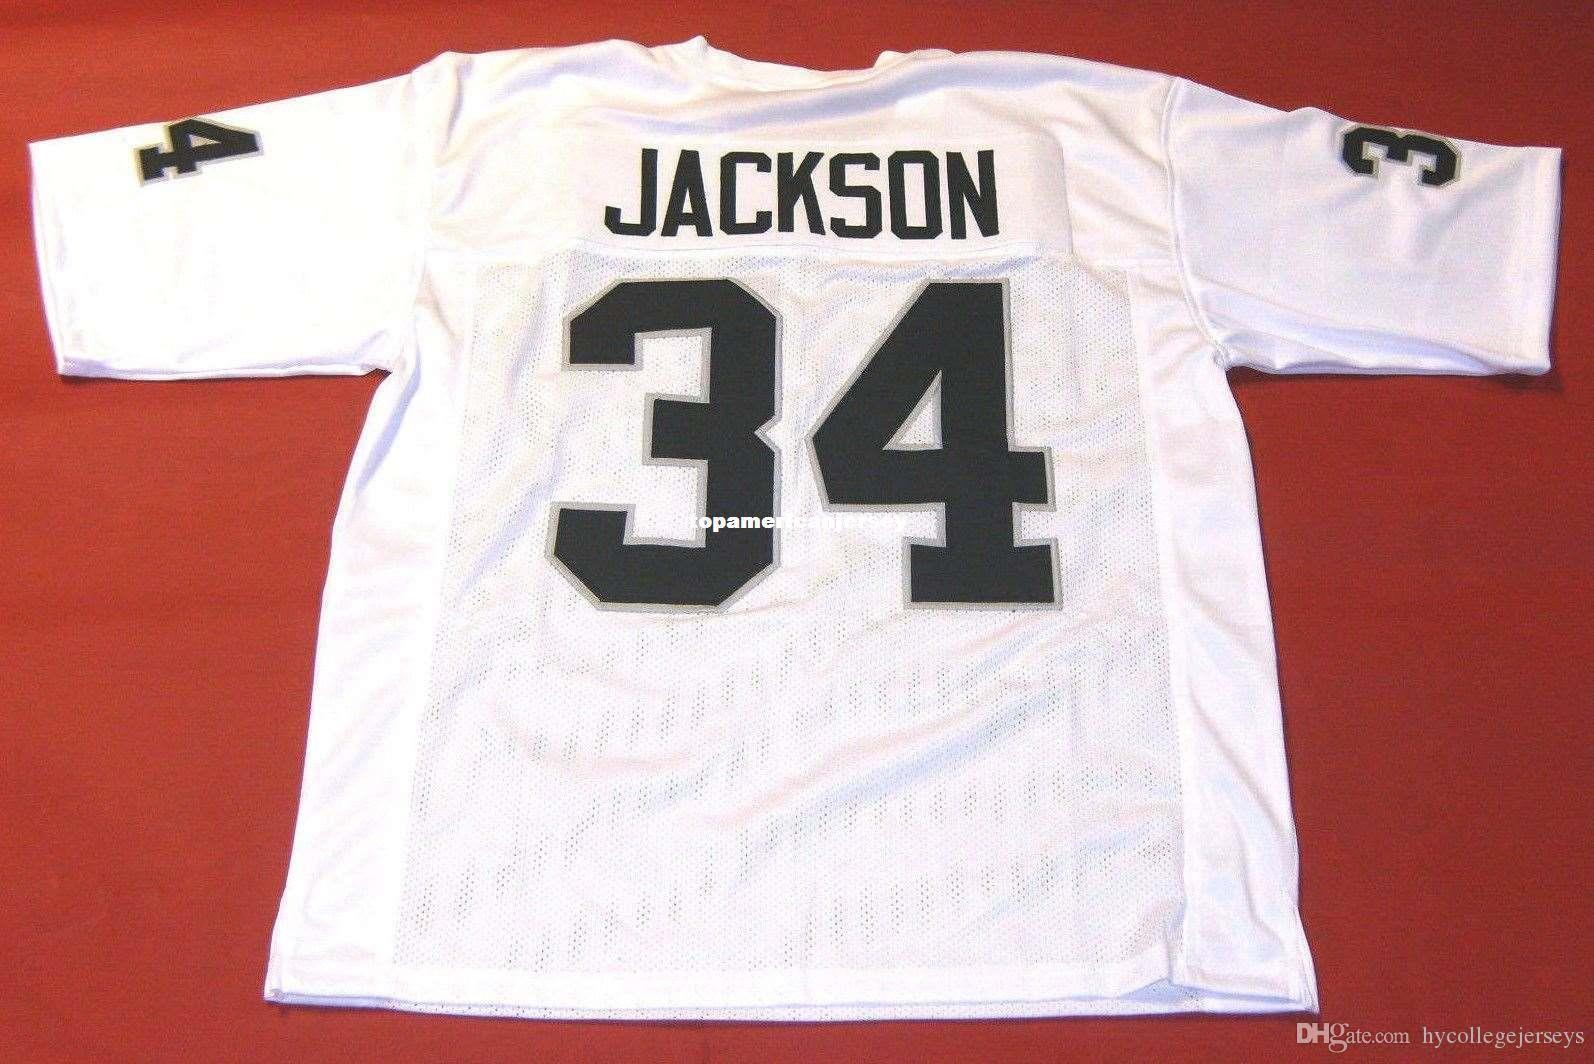 Barato Retro # 34 Bo Jackson Custom Mitchell Ness Jersey Mens de costura de costura Top S-5XL, 6XL Jerseys de futebol